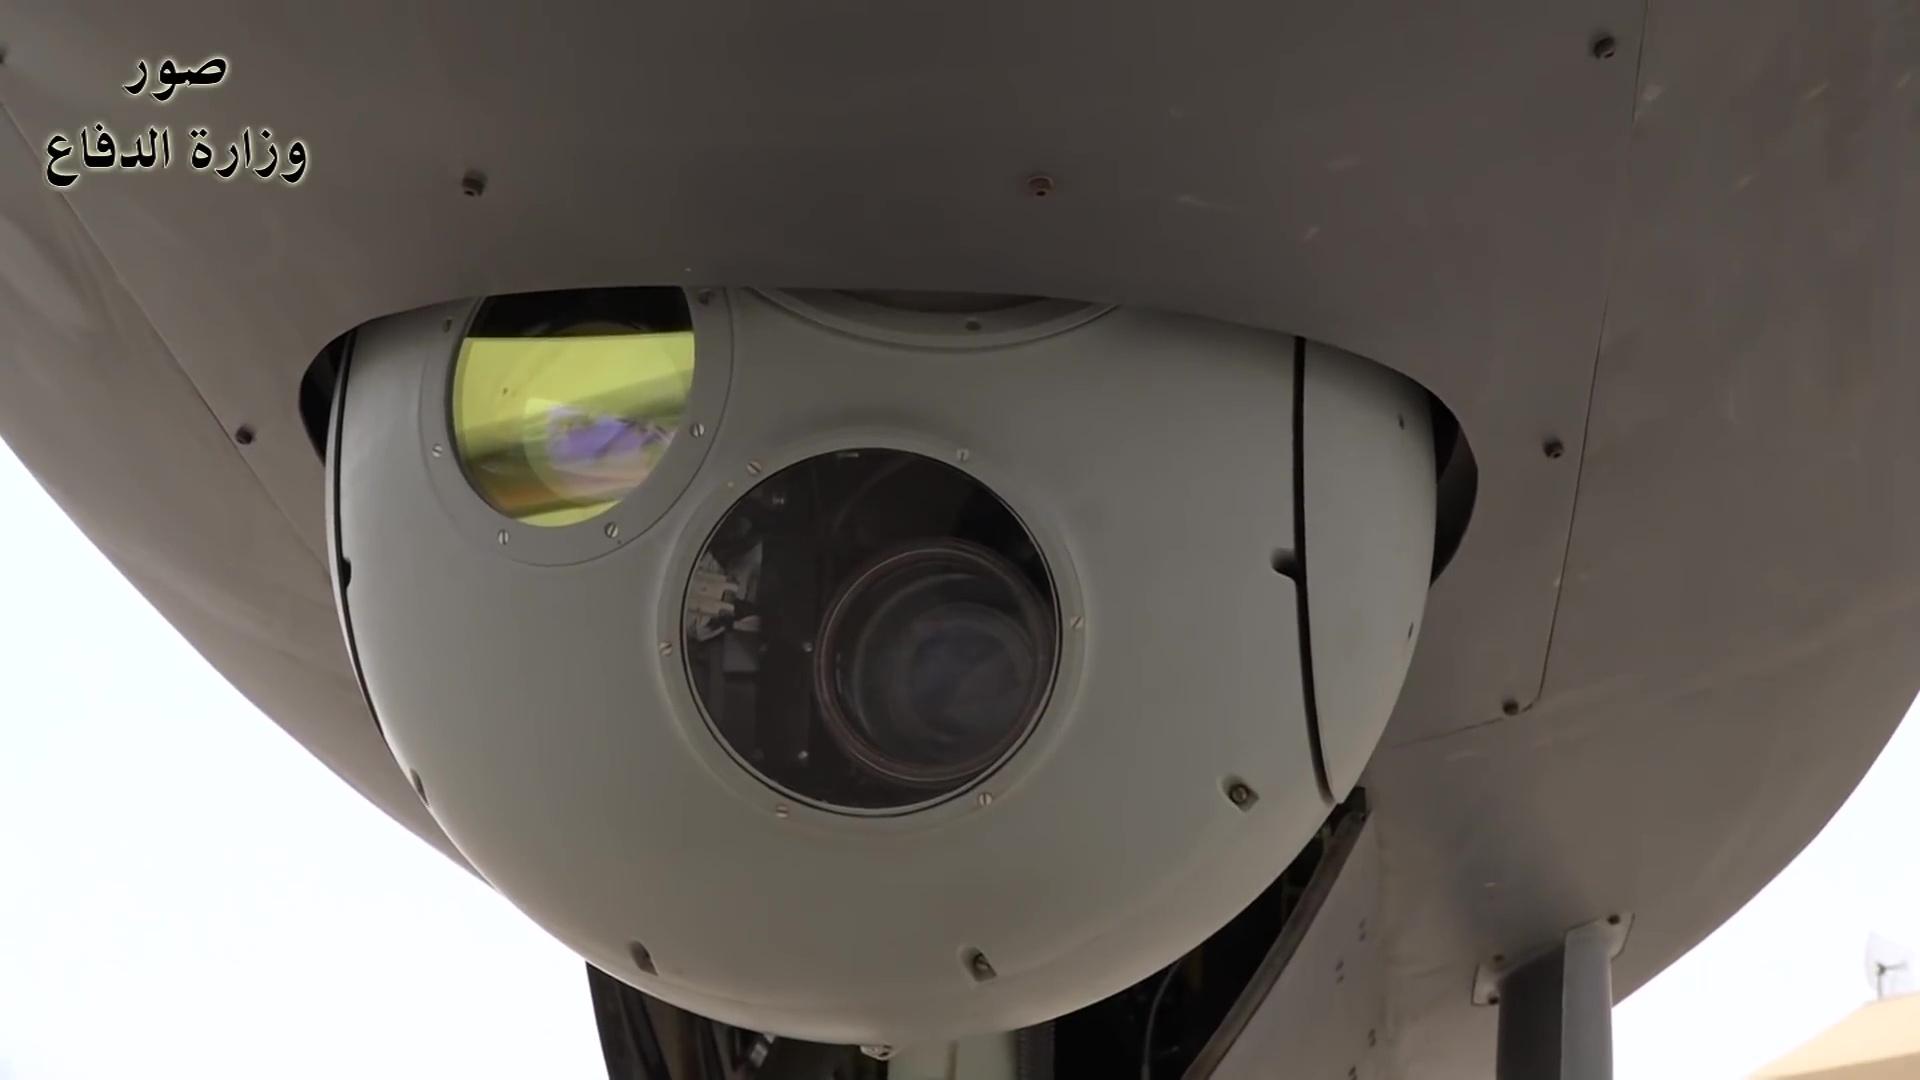 مسابقة رمضان الطائرات دون طيار  2018-02-18-Les-officiers-irakiens-parlent-du-drone-CH-4-13